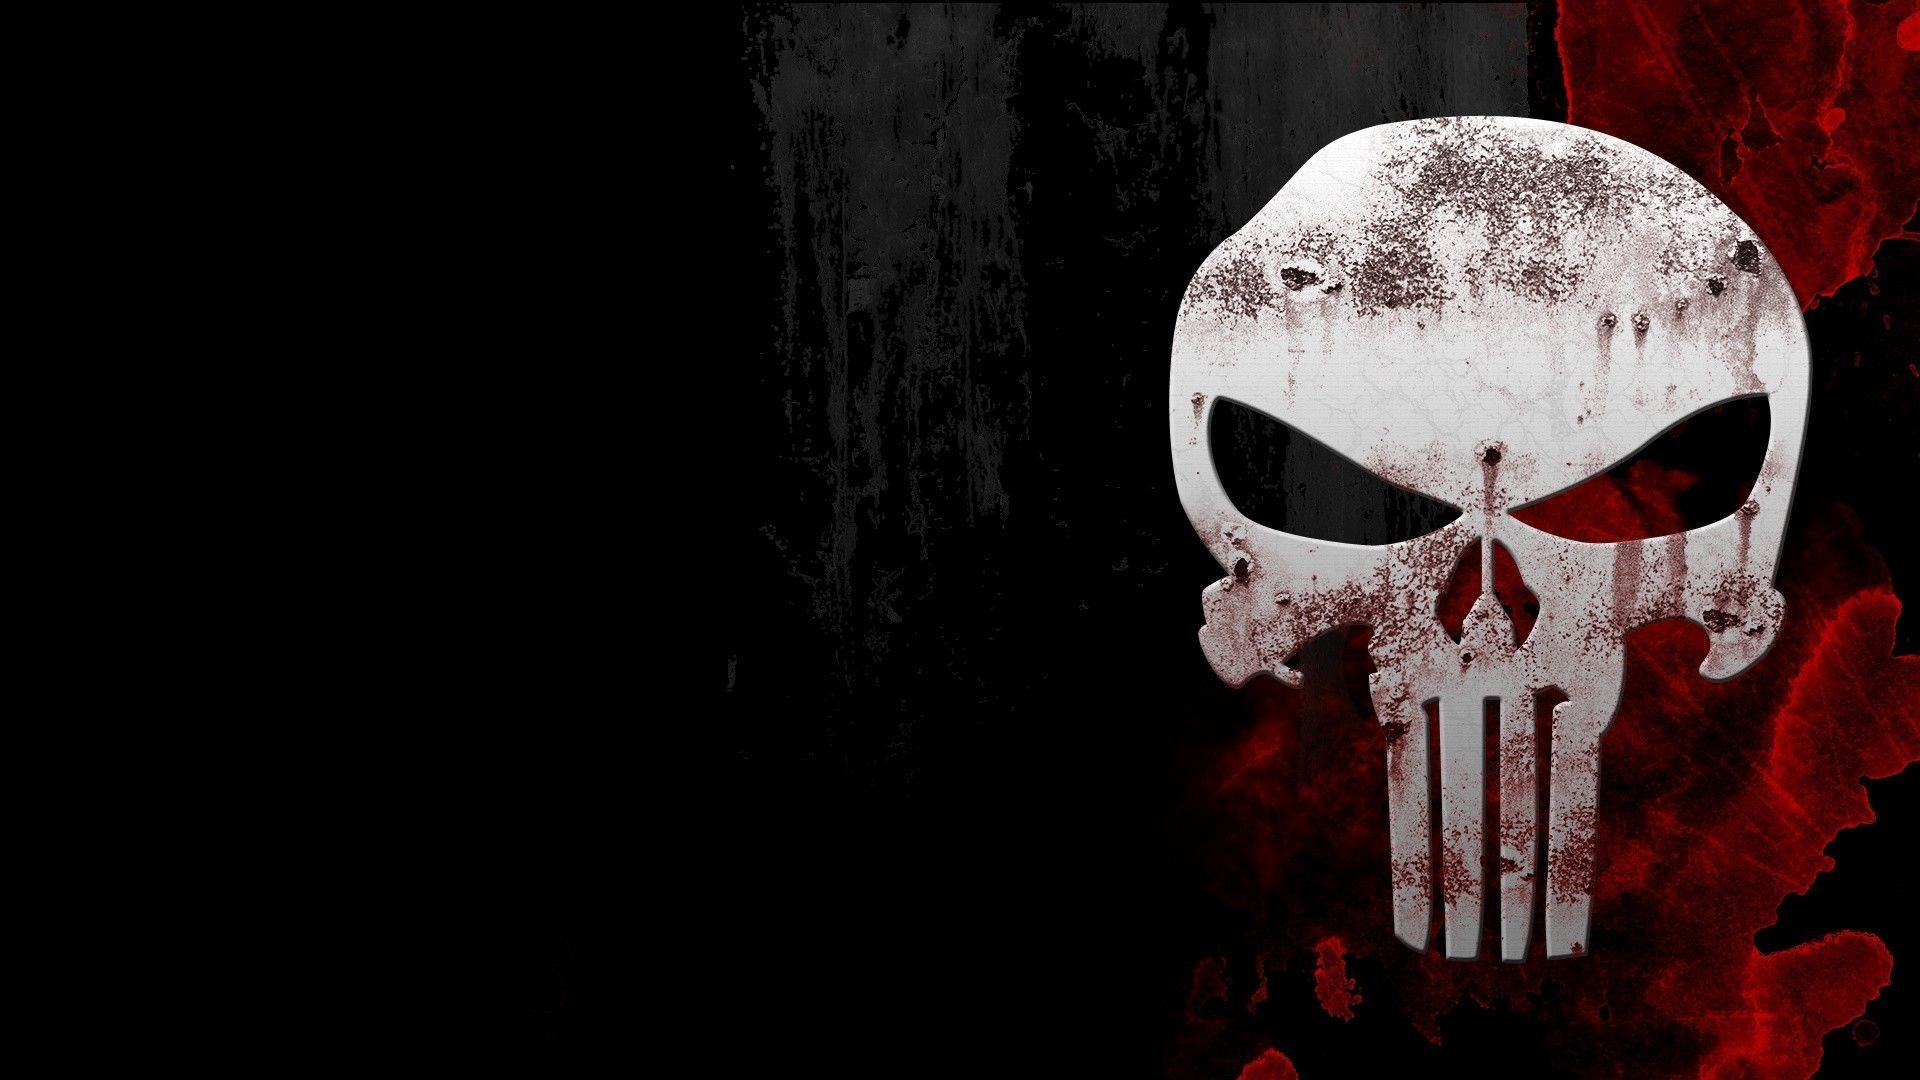 Free D Skull Wallpapers Wallpaper | HD Wallpapers | Pinterest | Skull  wallpaper, Hd skull wallpapers and Skull pictures